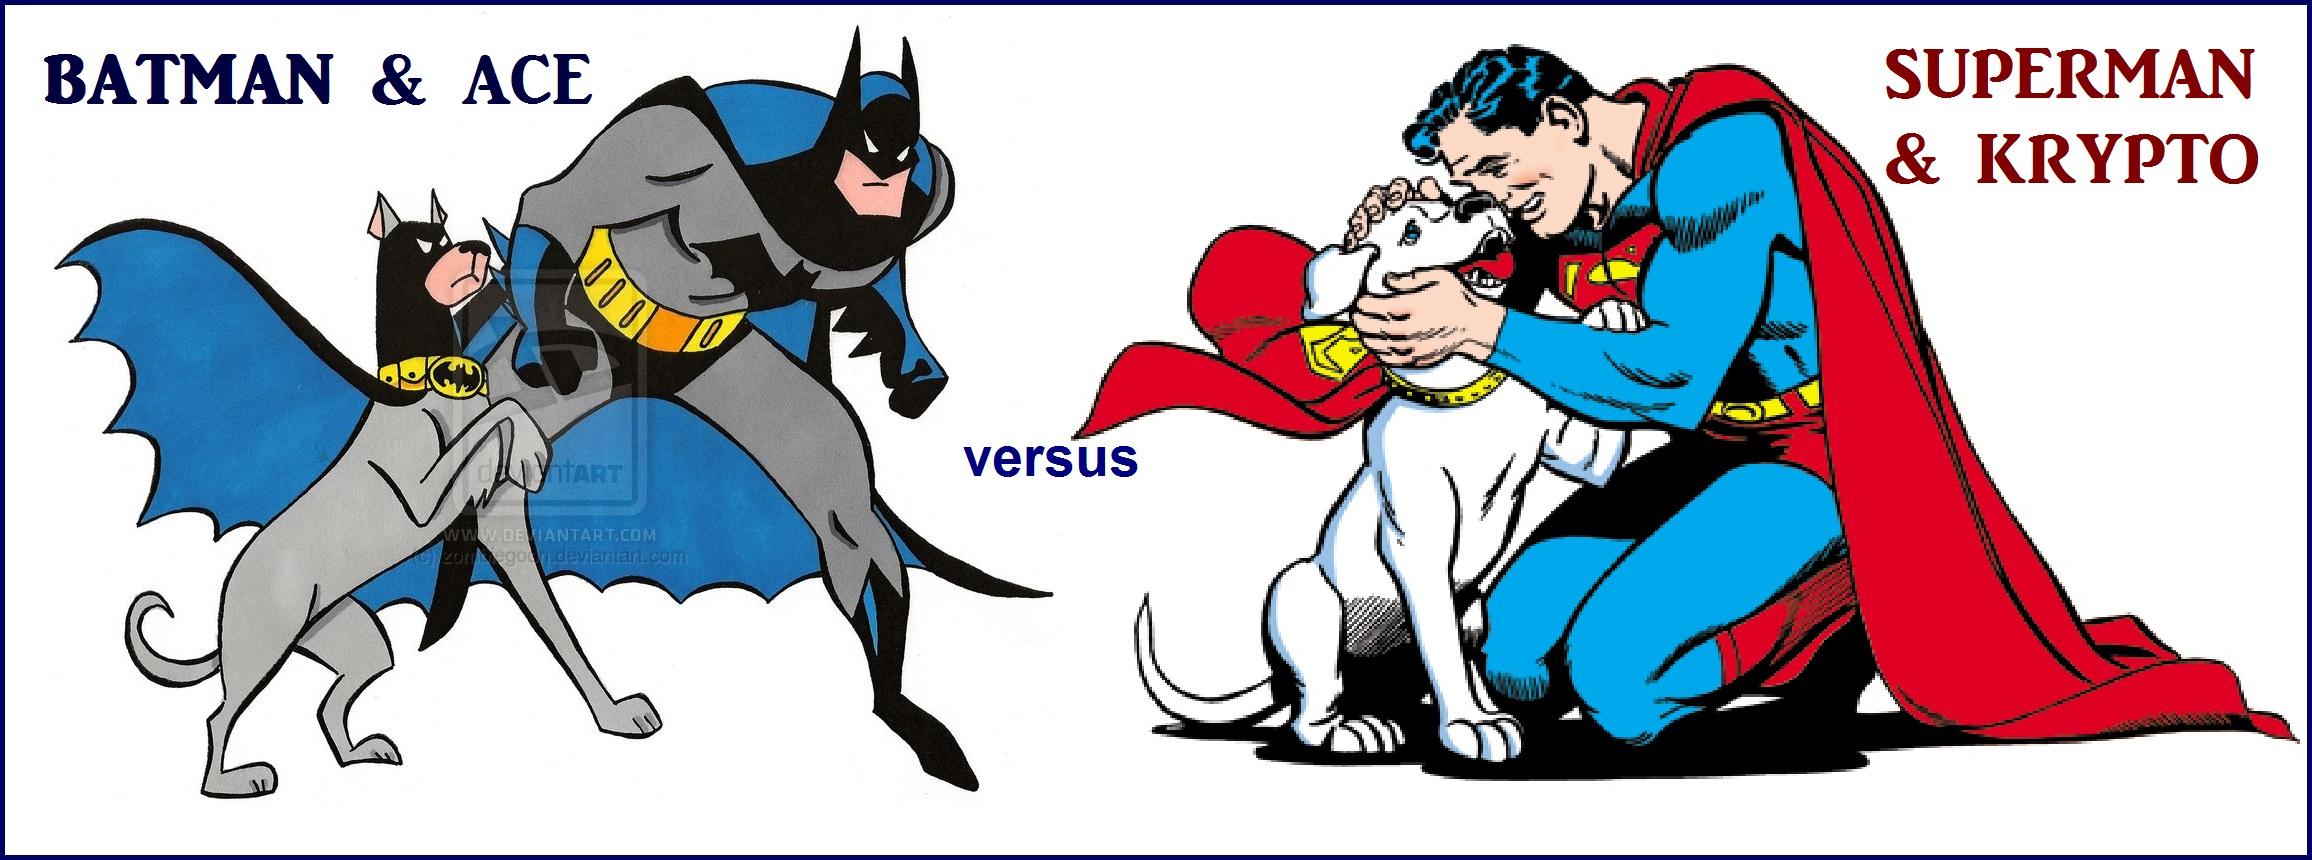 4349254------+#+-+00000000000000+bat+hound+&+batman+and+krypto+&+superman+.